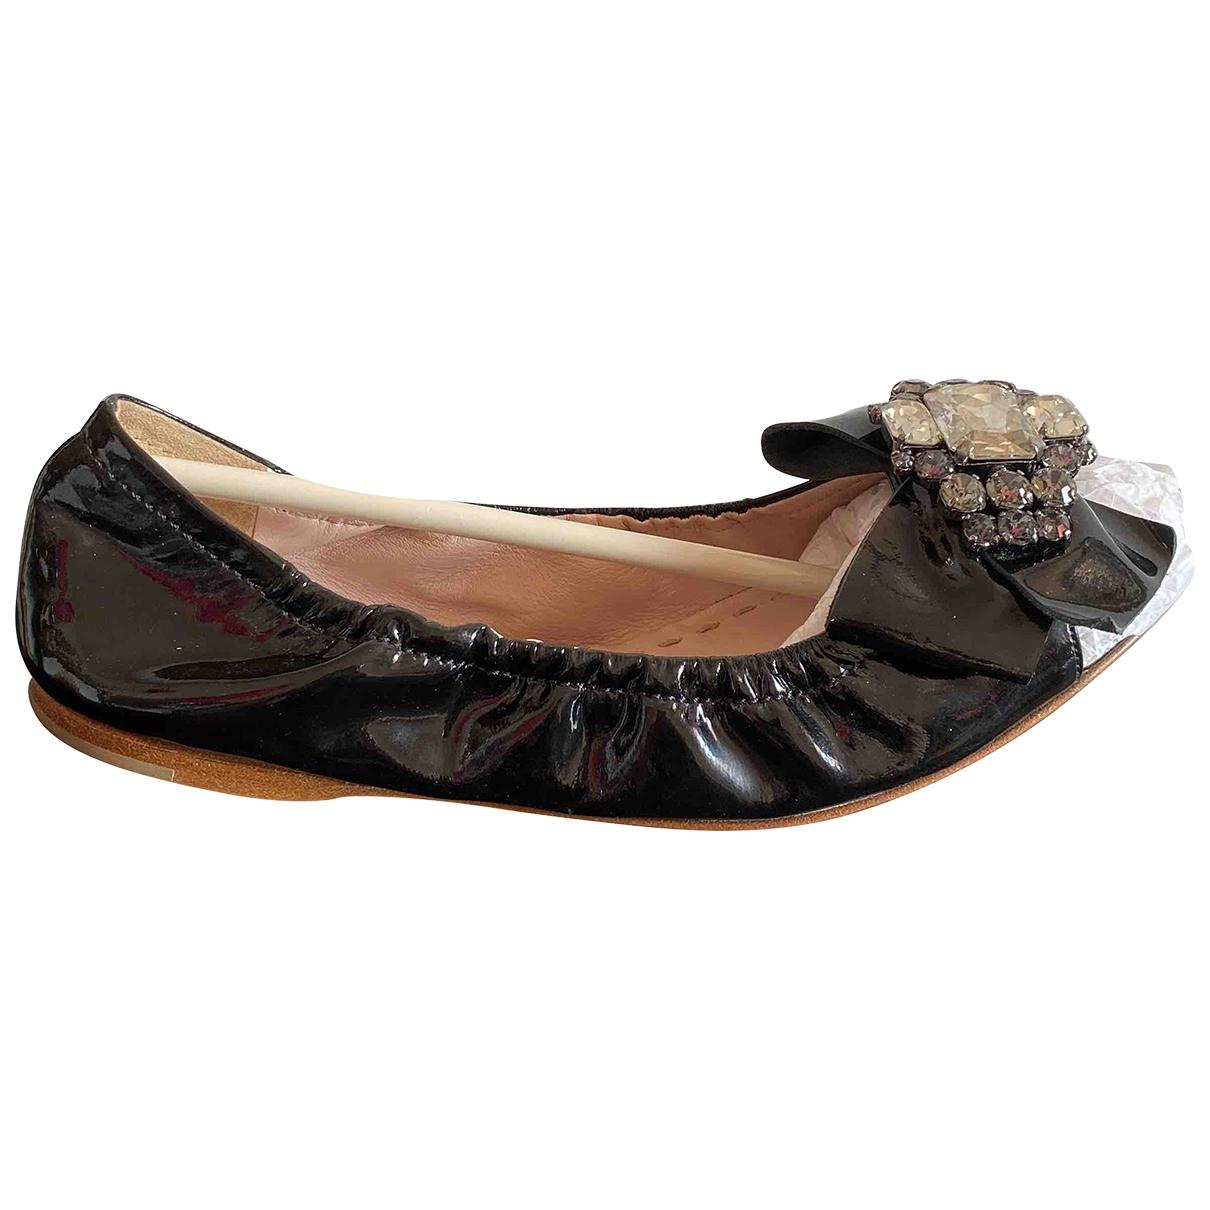 Miu Miu \N Black Patent leather Ballet flats for Women 36.5 EU